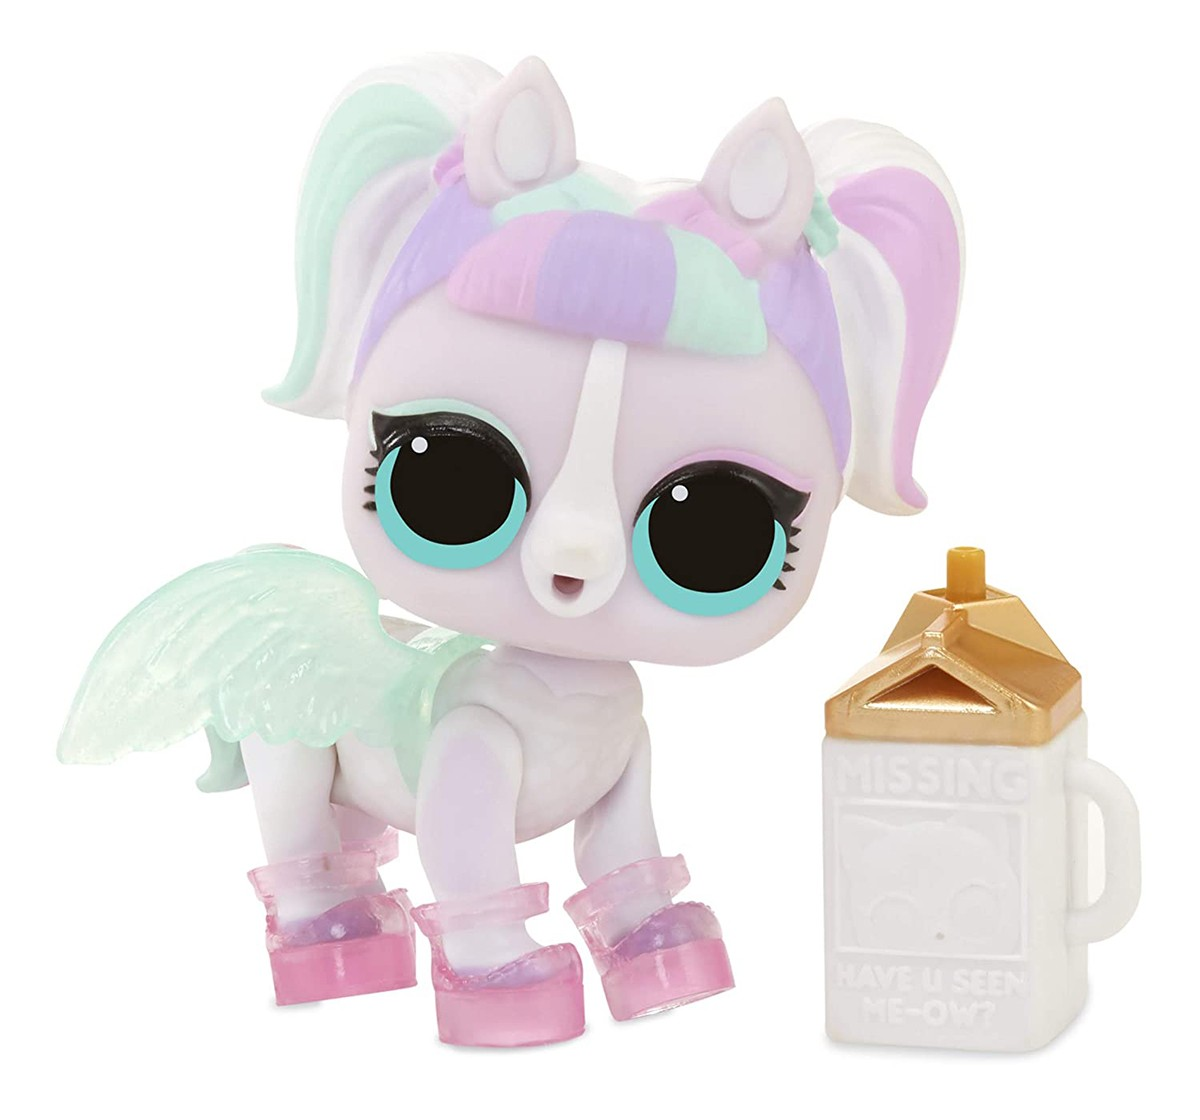 L.O.L. Surprise Pets Collectible Dolls for Kids age 3Y+